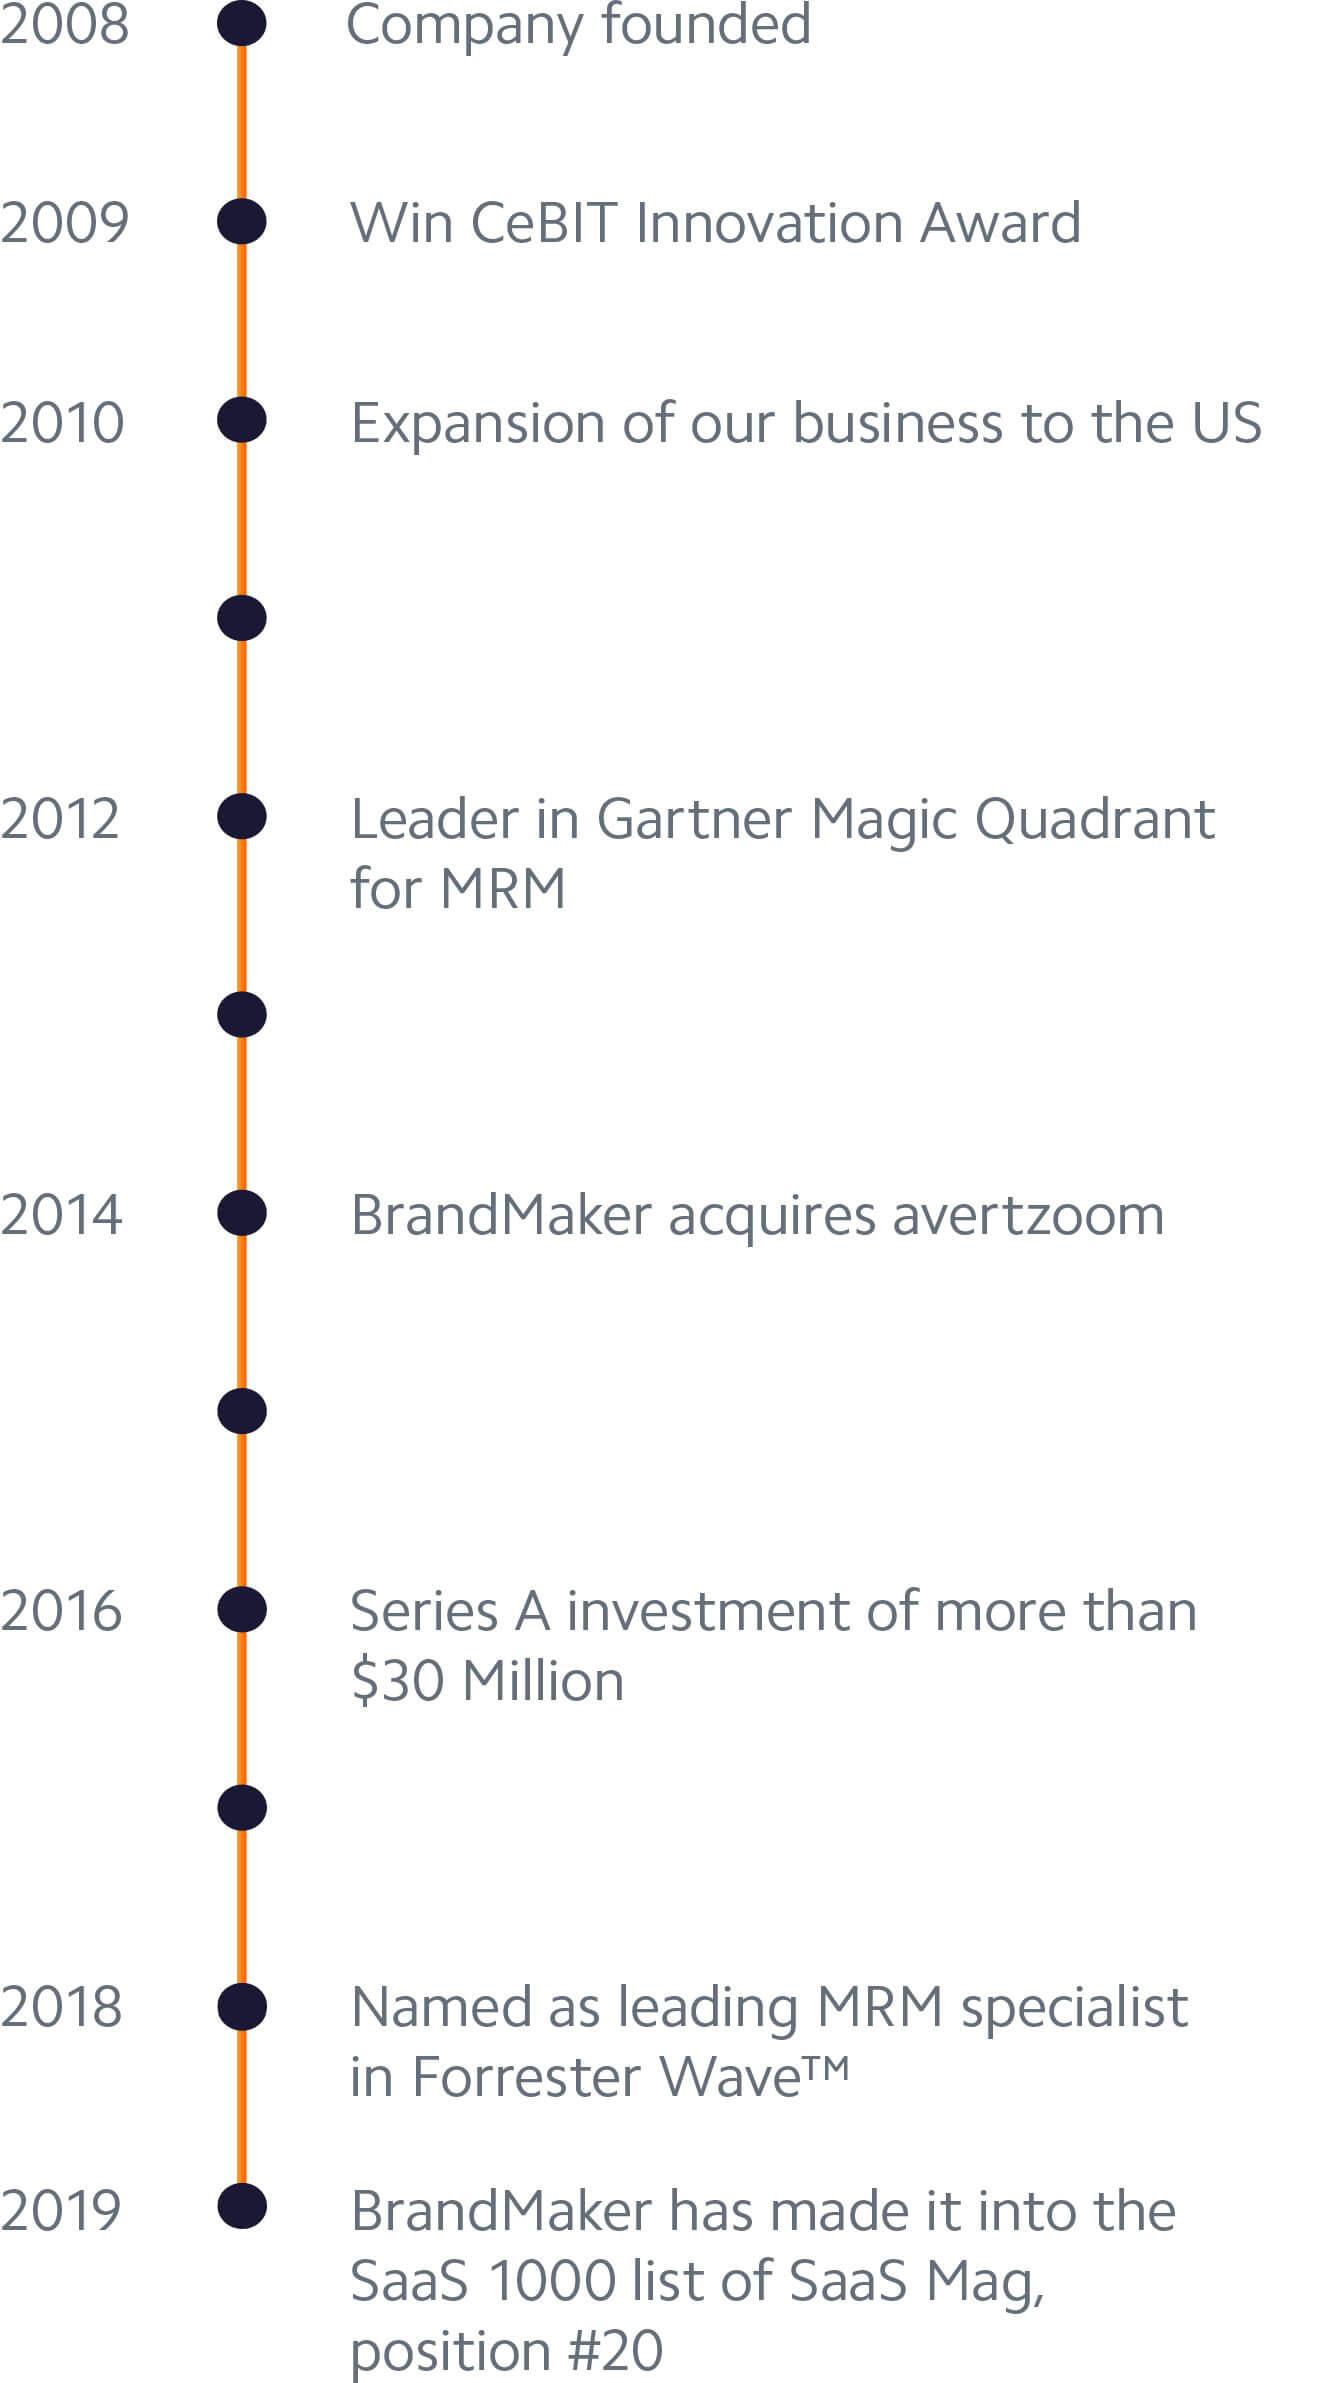 History Milestones of BrandMaker